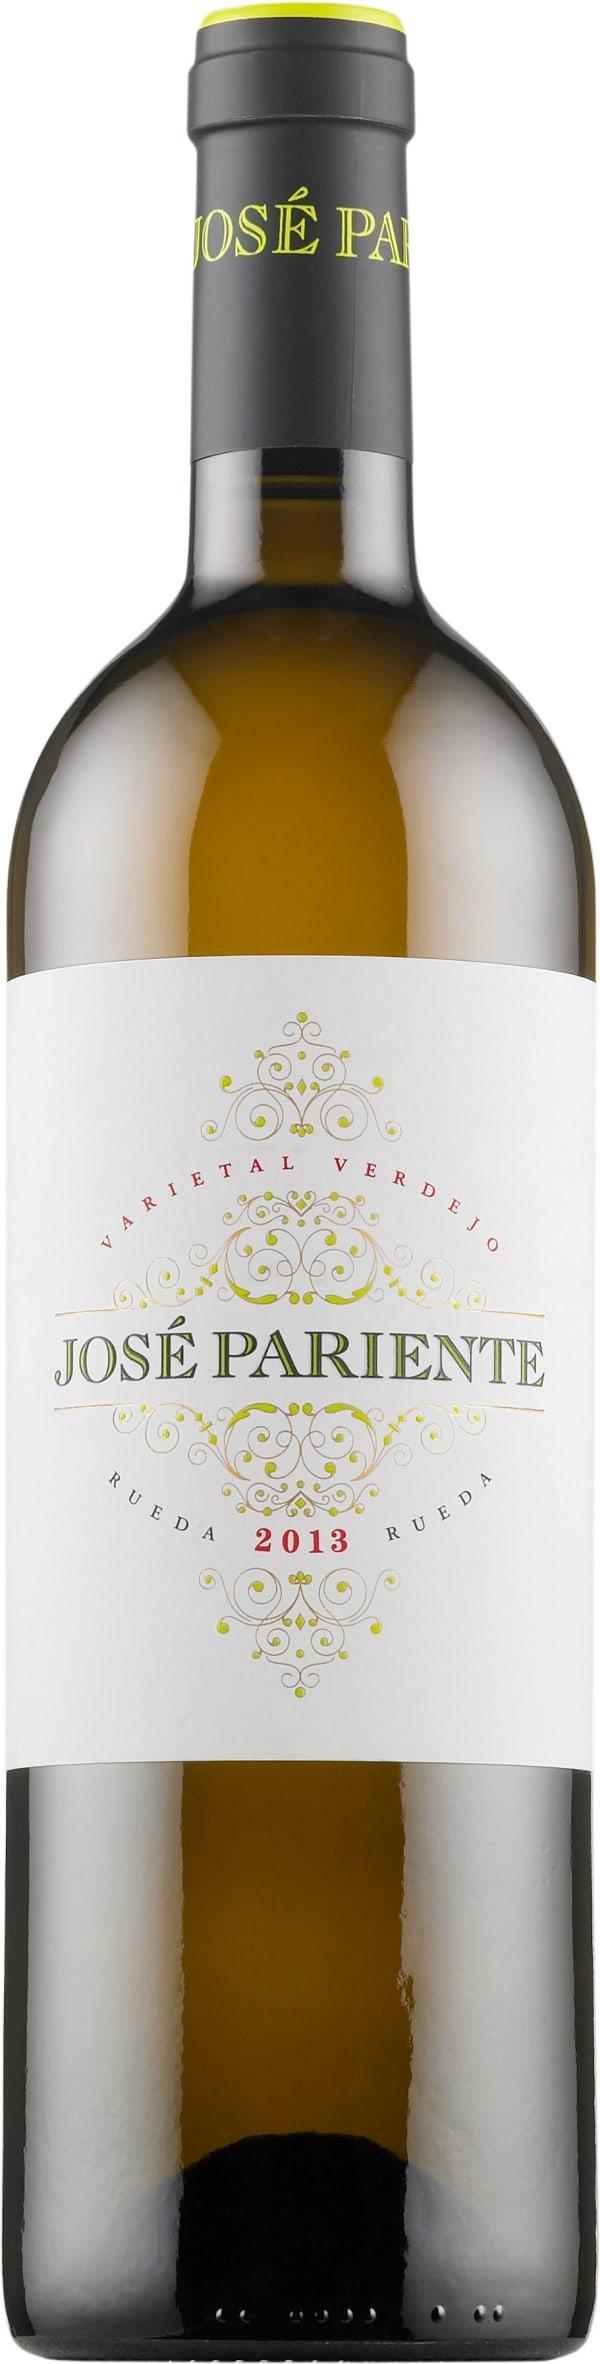 José Pariente Varietal Verdejo 2018